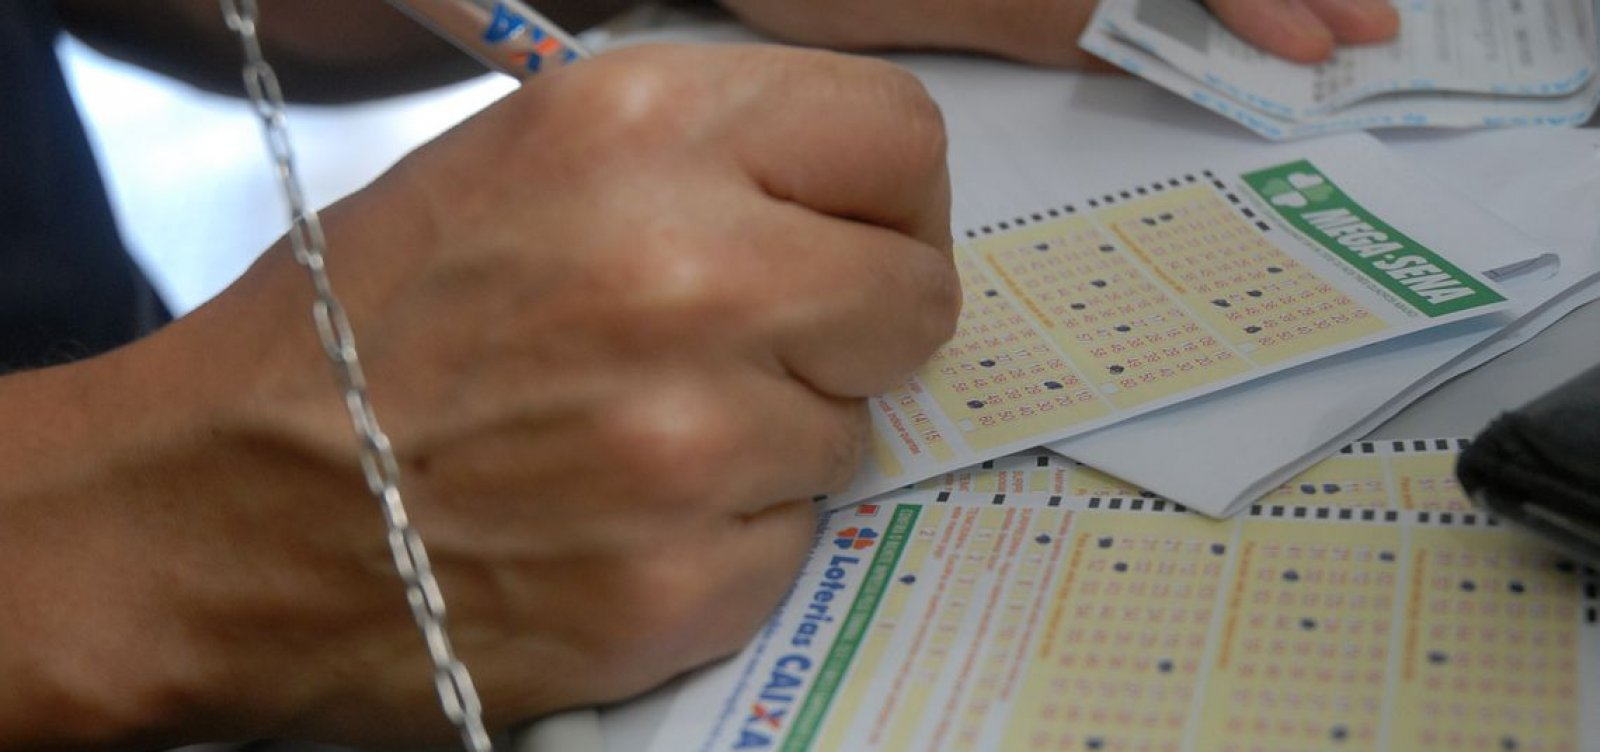 [Mega-Sena vai sortear prêmio de R$ 45 milhões neste sábado]